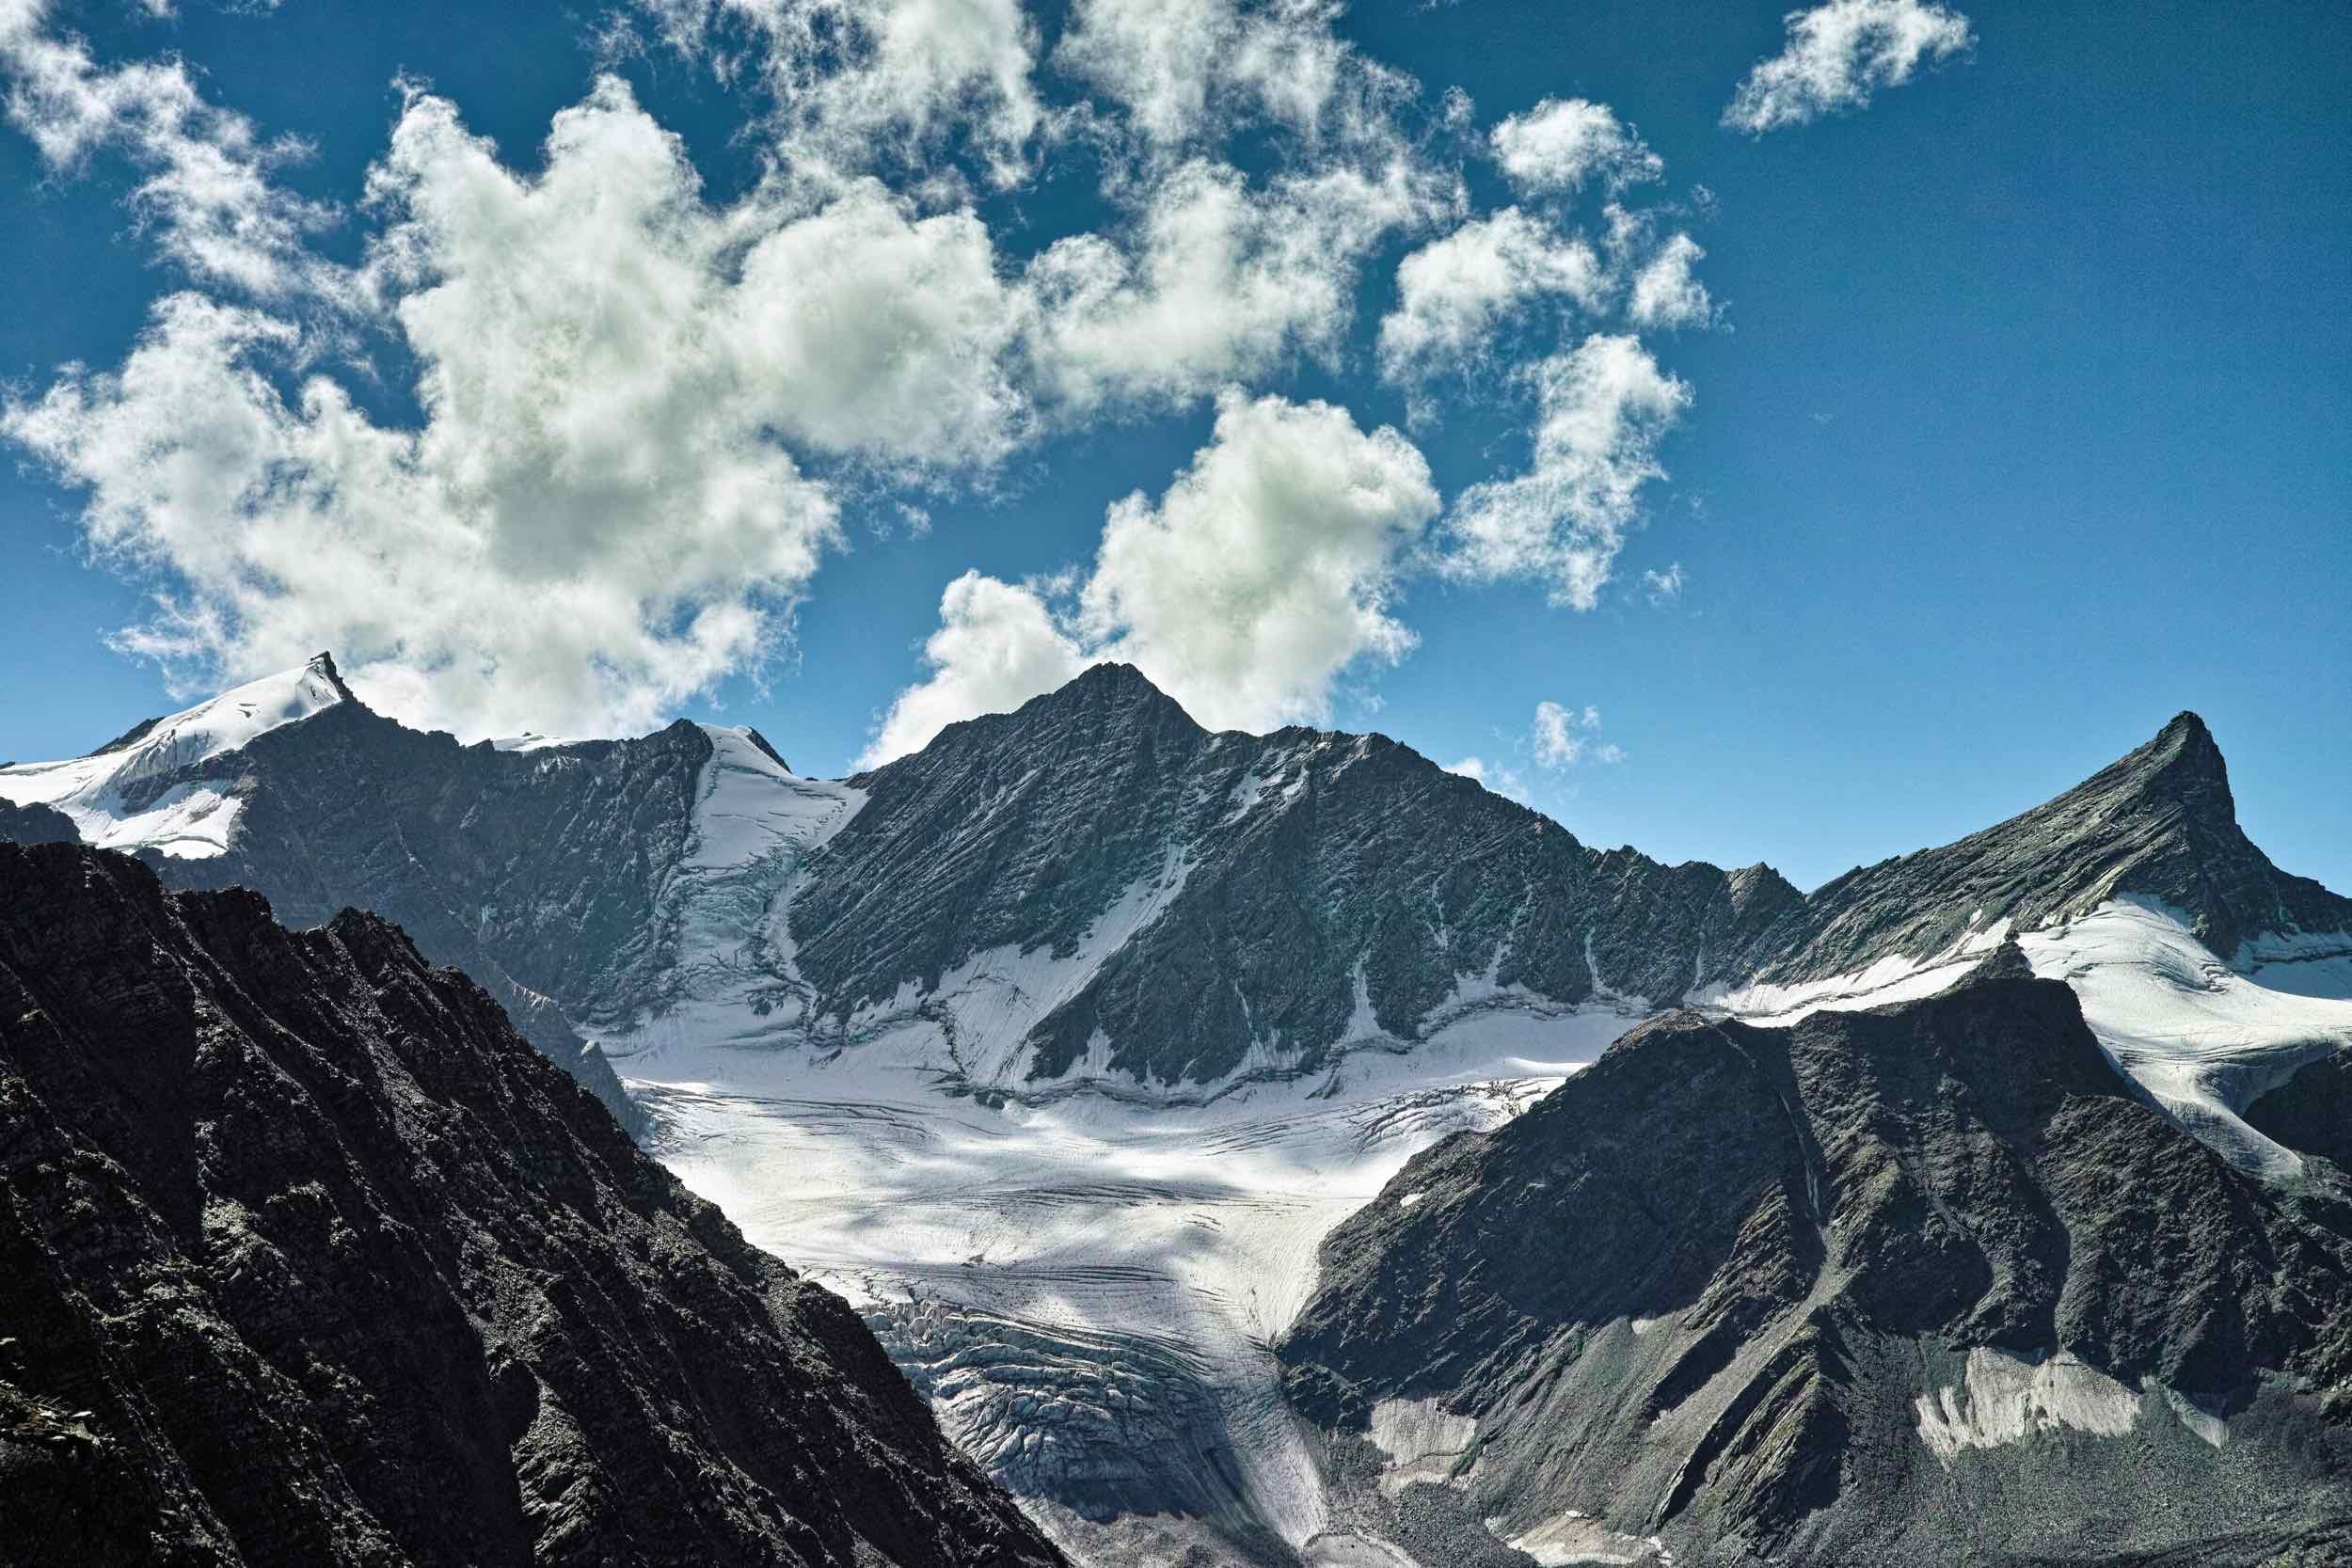 Kuja peak and glaciers to the east of Kalah pass